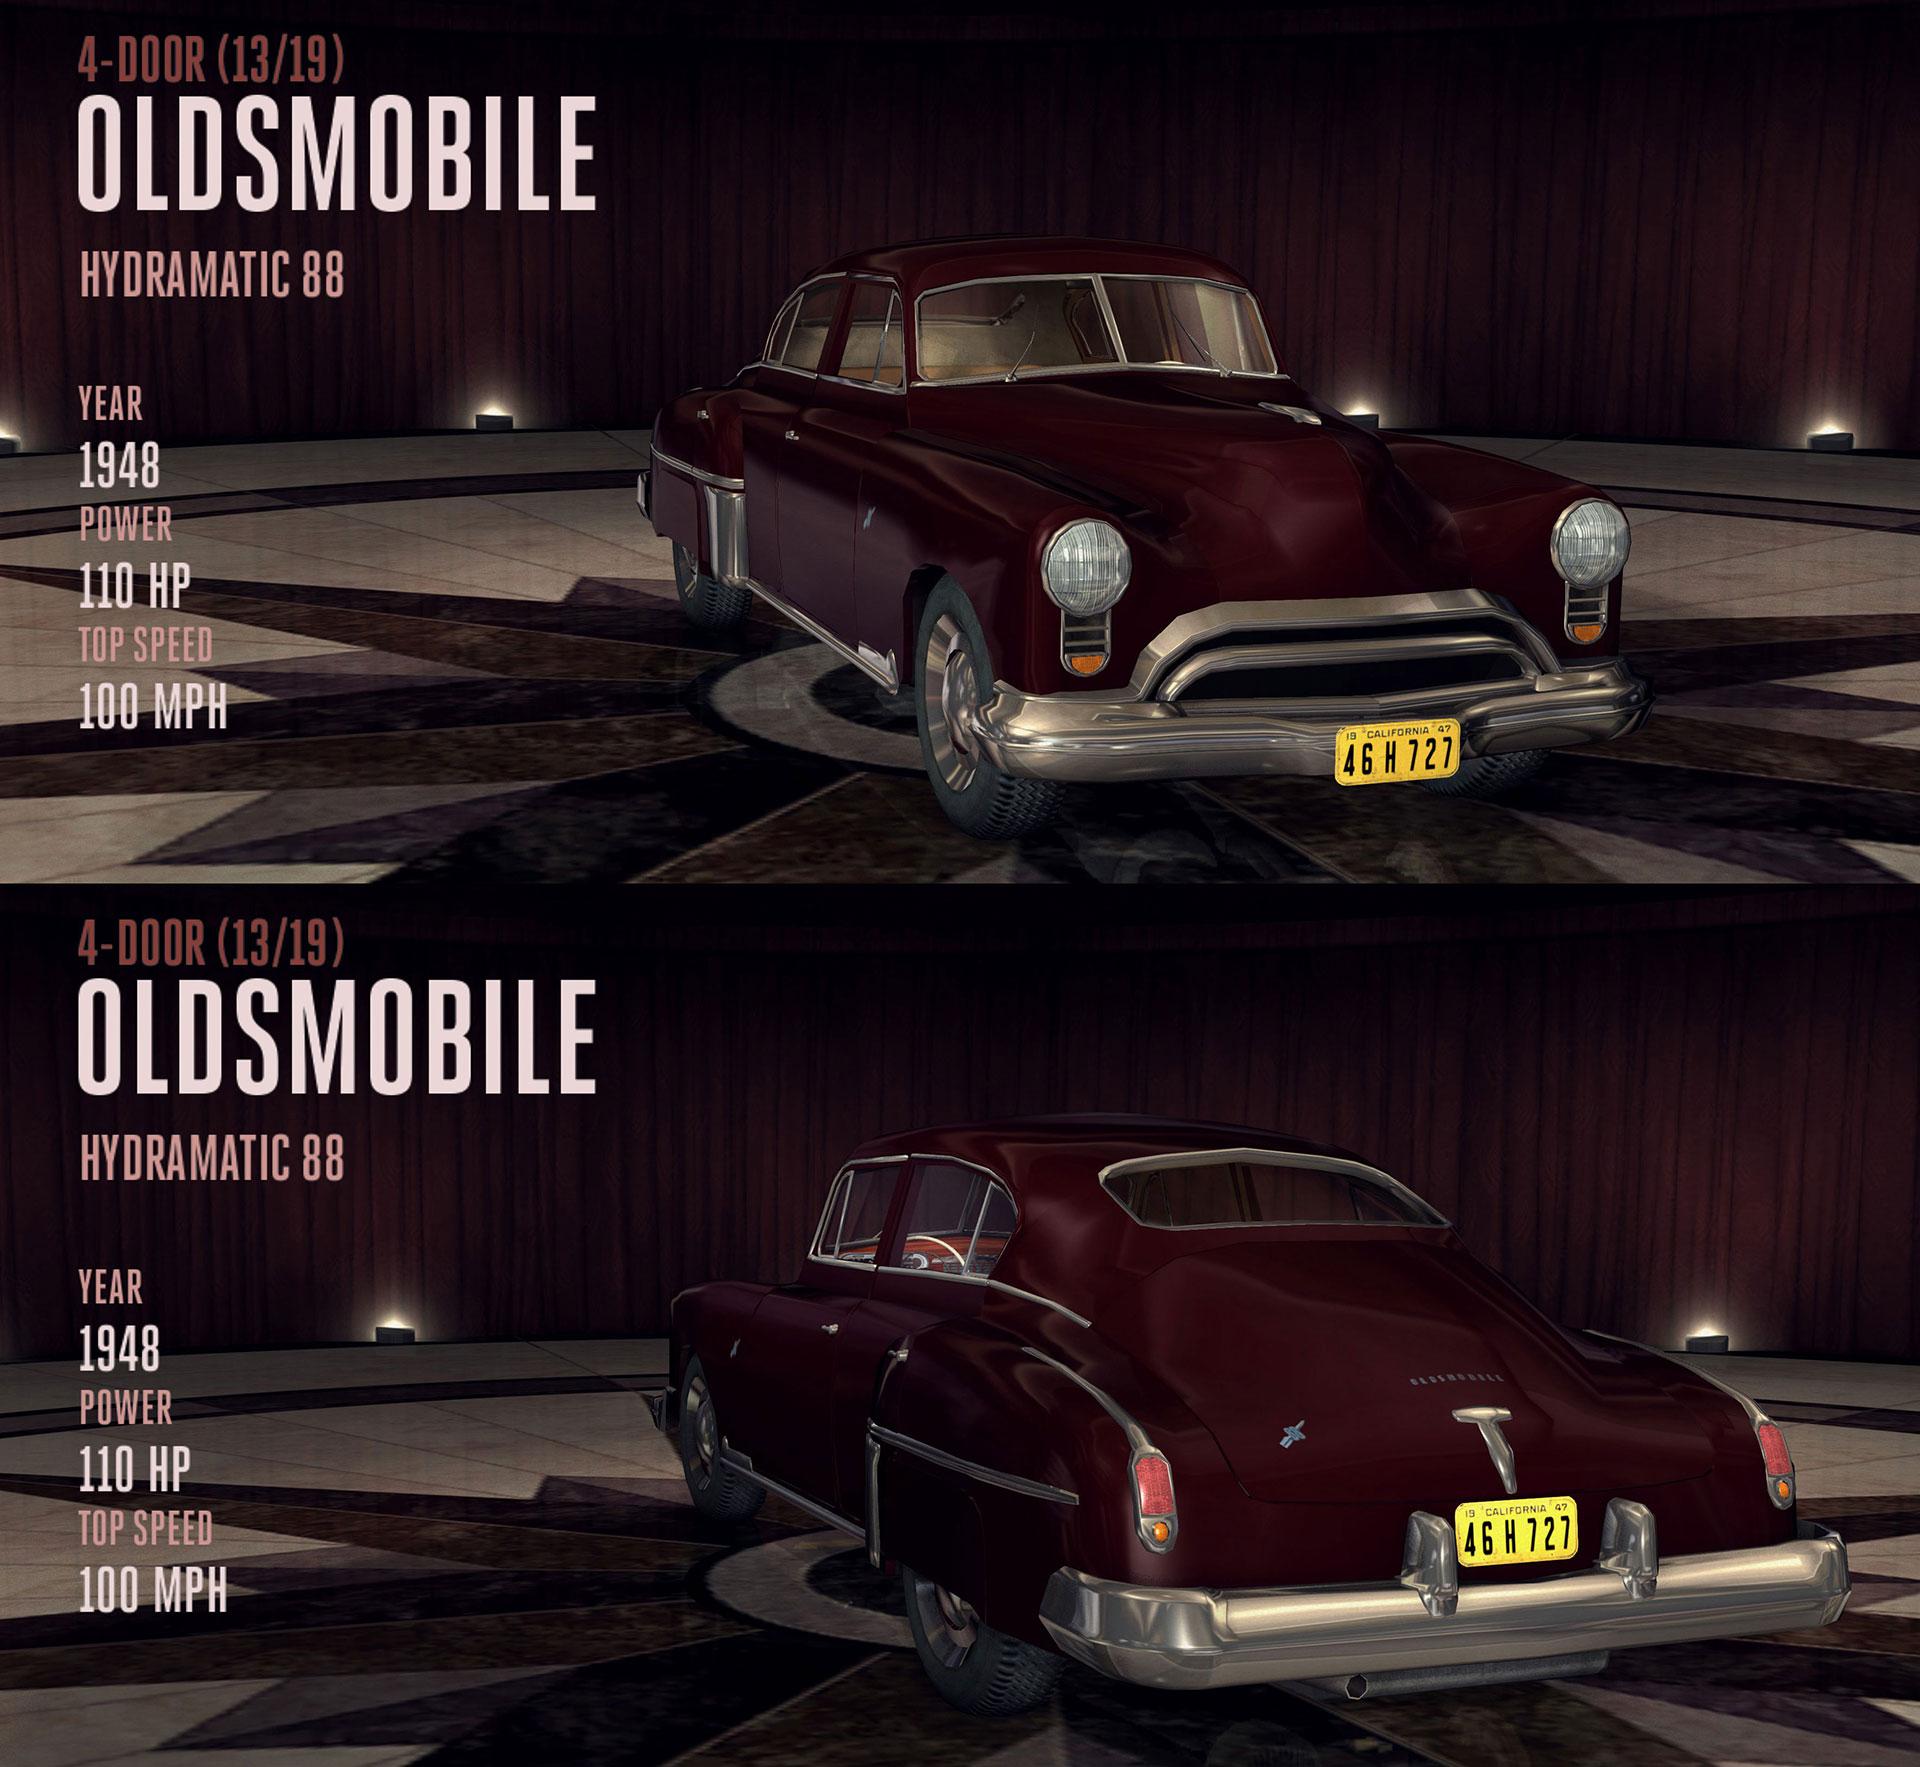 File:OldsmobileHydramatic.jpg